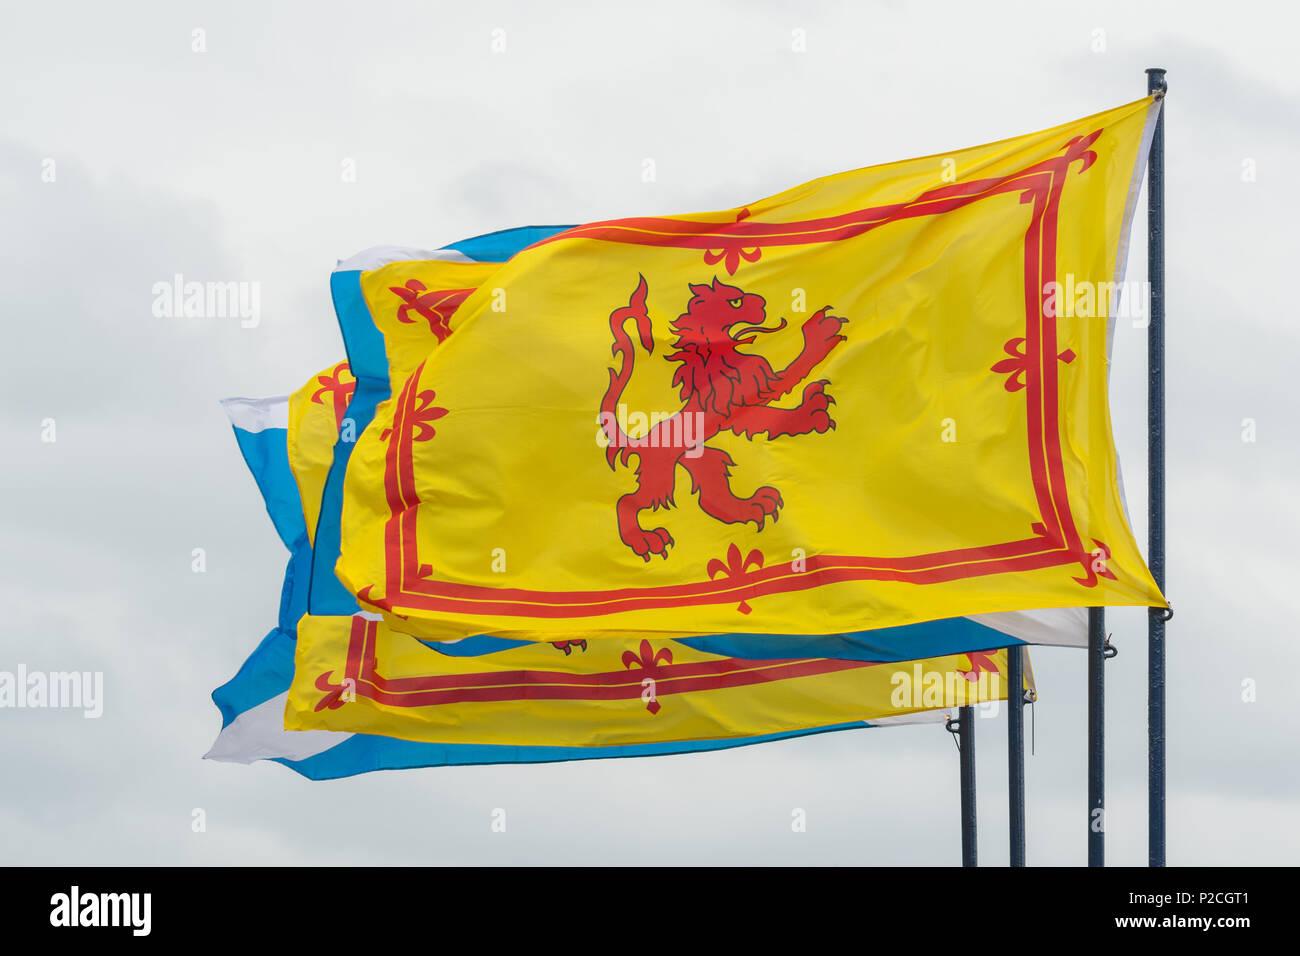 Scottish Flags - the Lion Rampant or Royal Banner of Scotland flying alongside the Scottish saltire - Stock Image